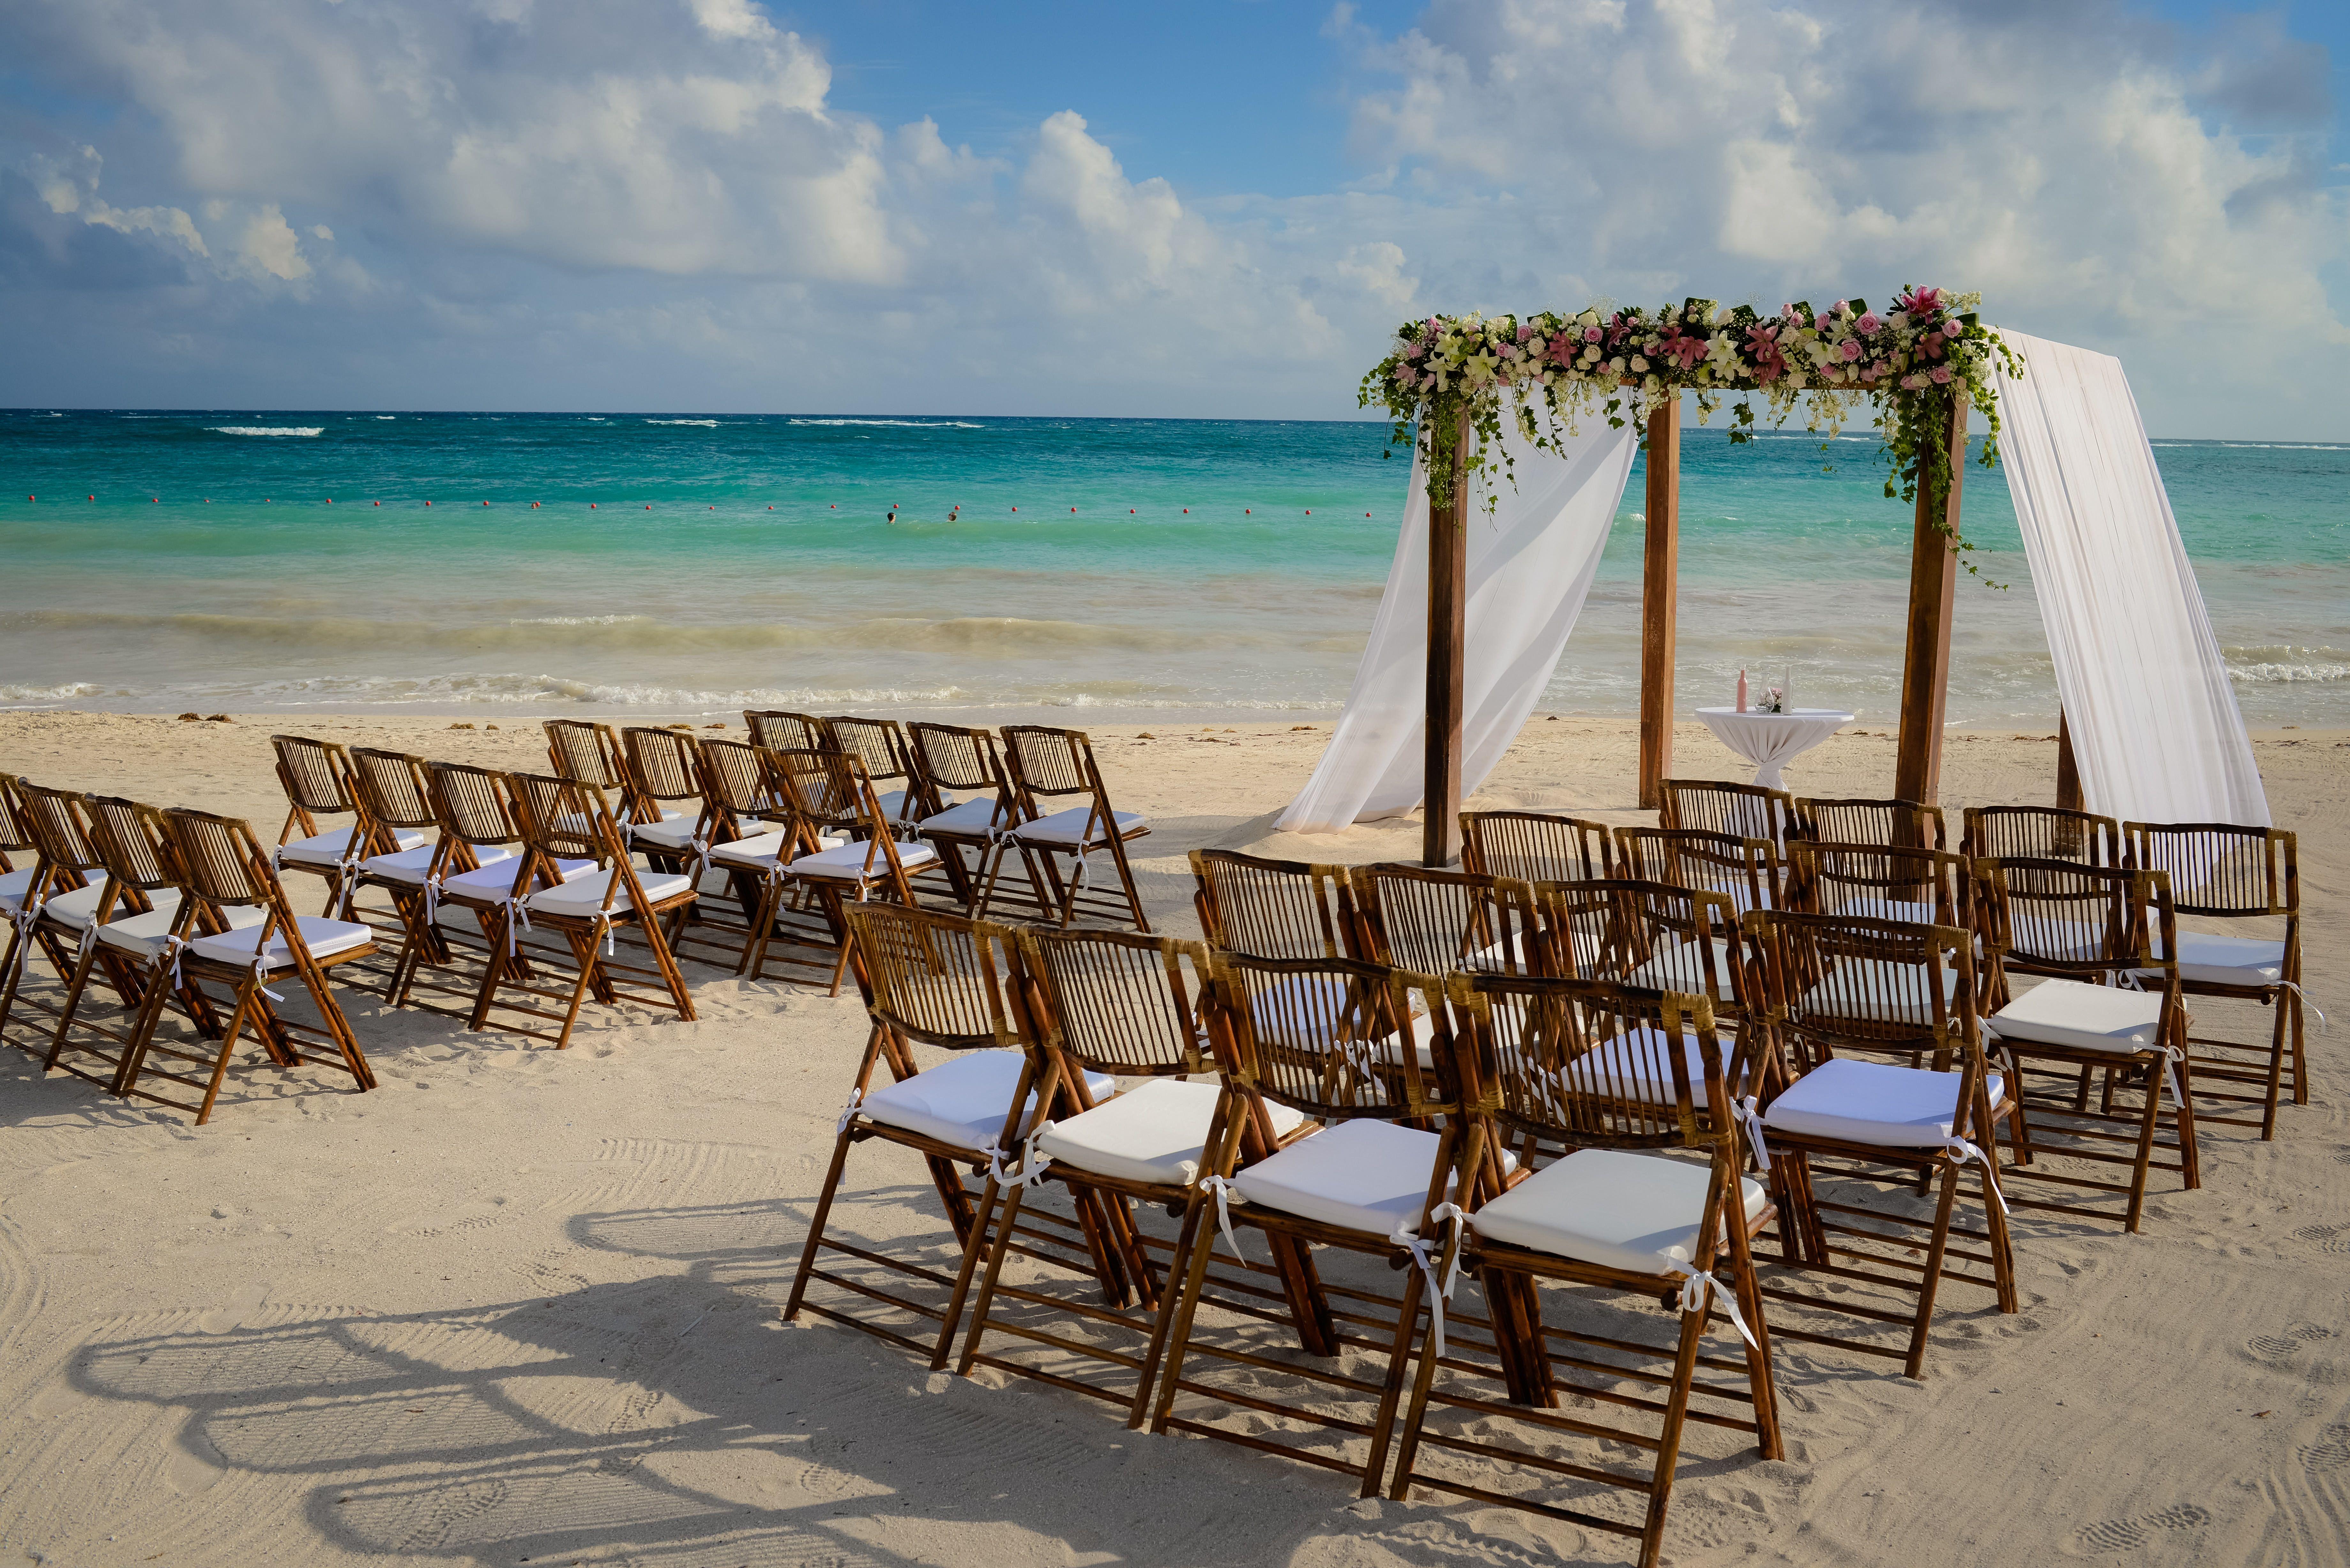 Beautiful Beach Ceremony Set Up Here At Dreams Tulum Resort Spa Destinationwedding We Dreams Tulum Dreams Tulum Resort Destination Wedding Locations Beach